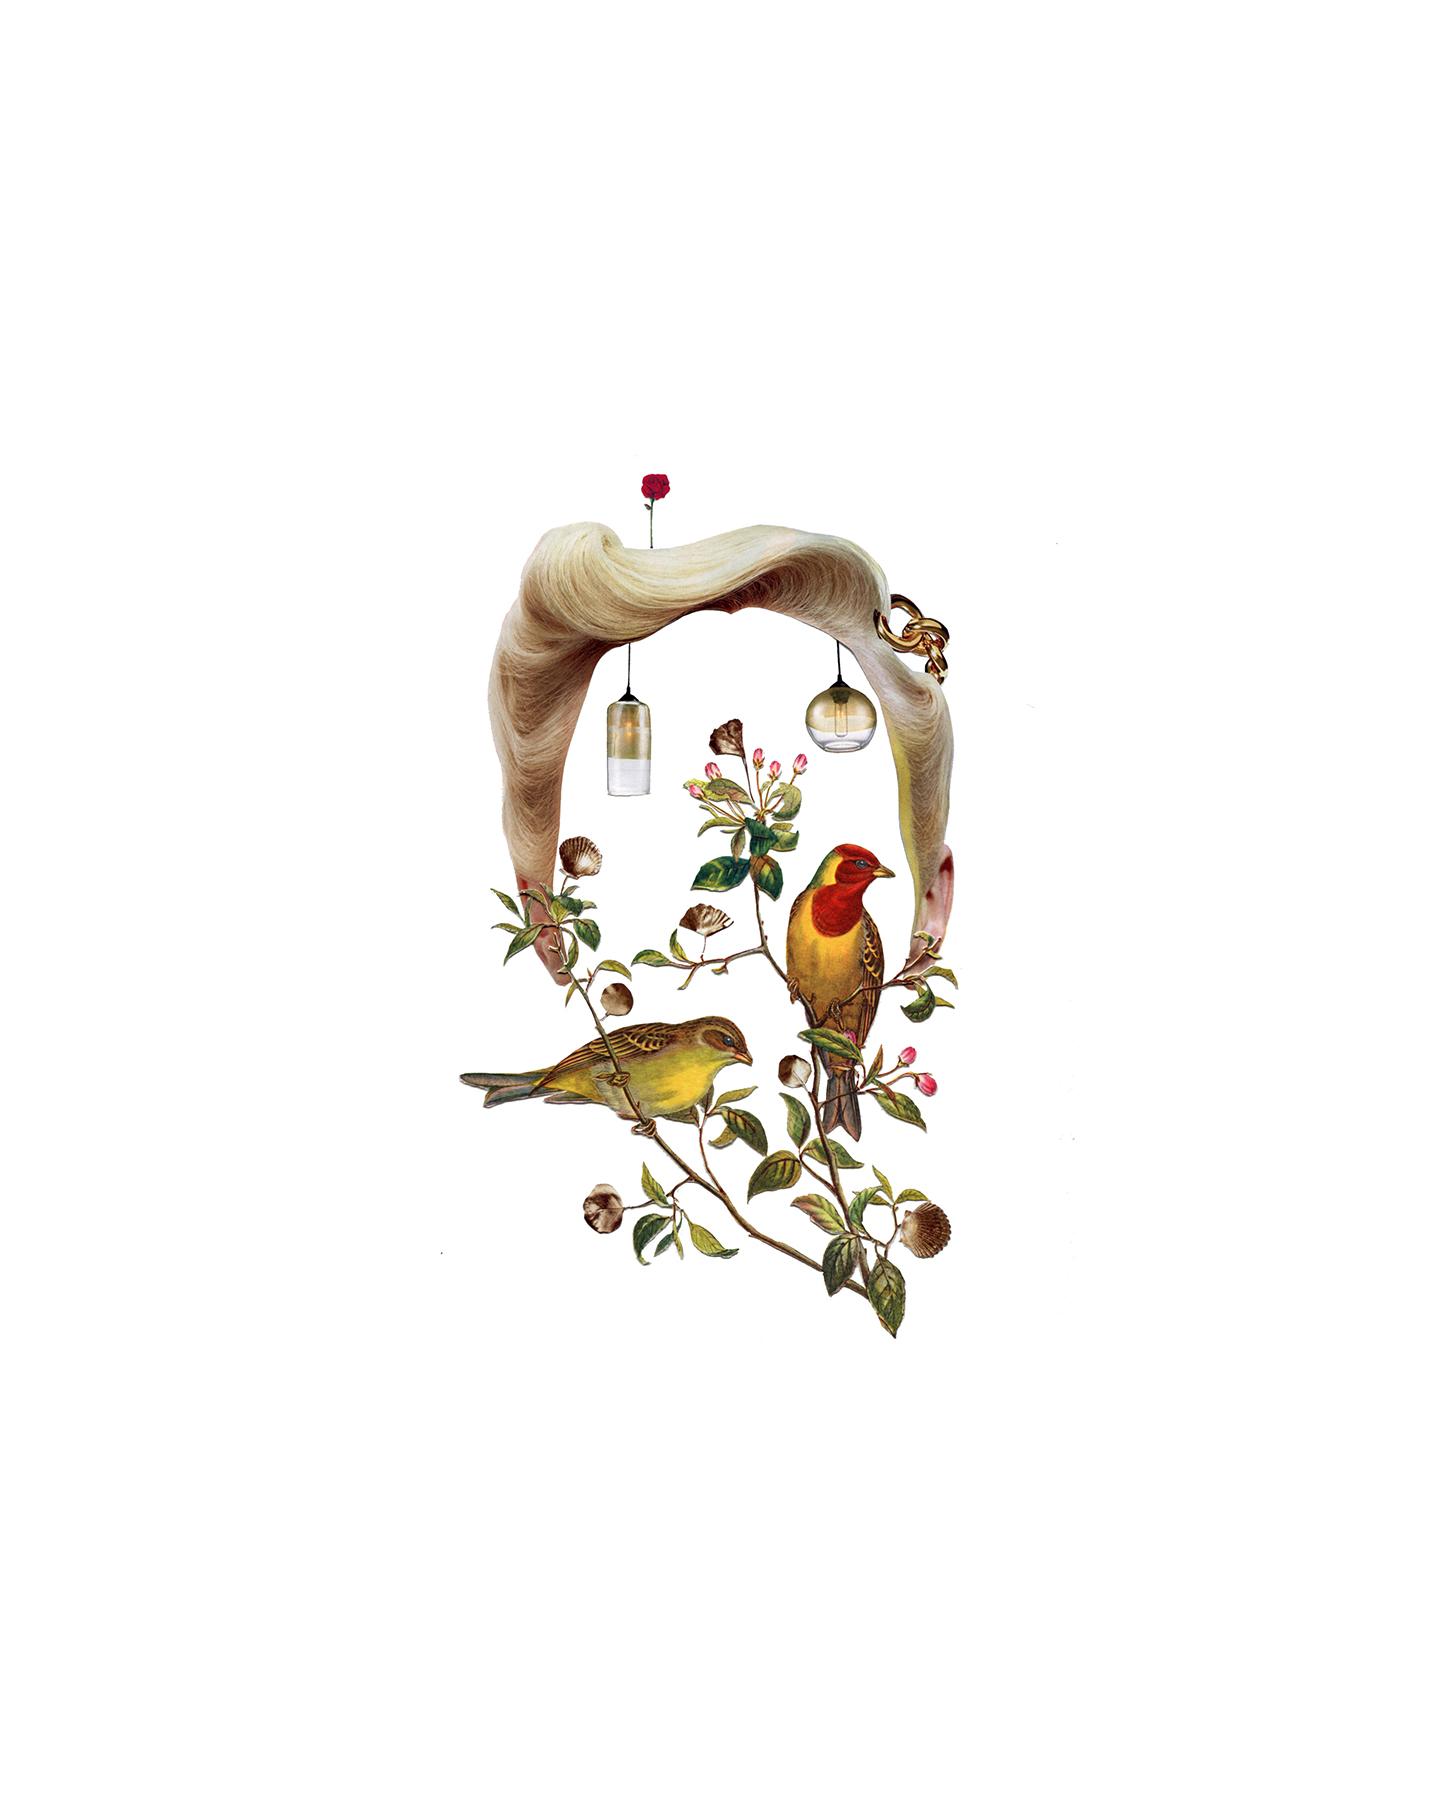 Tatiana Flis,  Birdbrain , Collage, 16x20